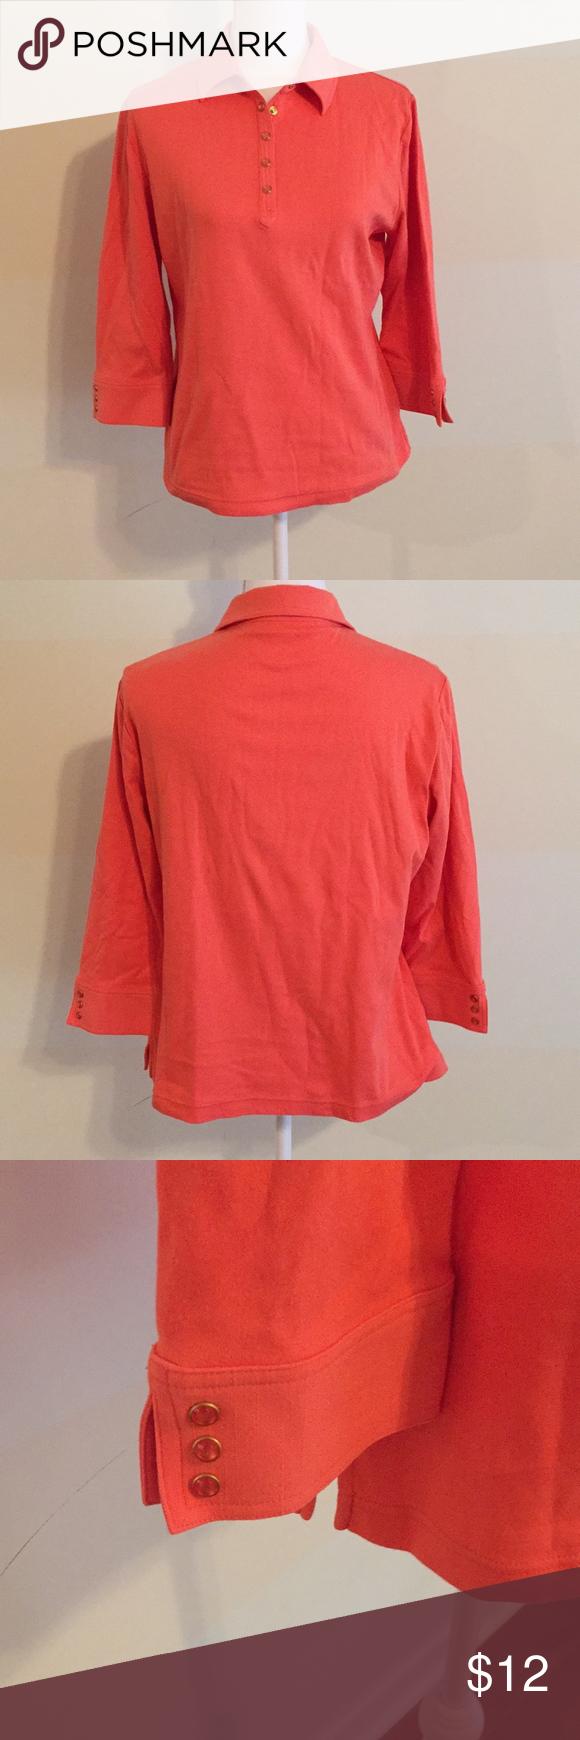 Cali York Polo Collared 34 Sleeve Coral Shirt In 2018 My Posh